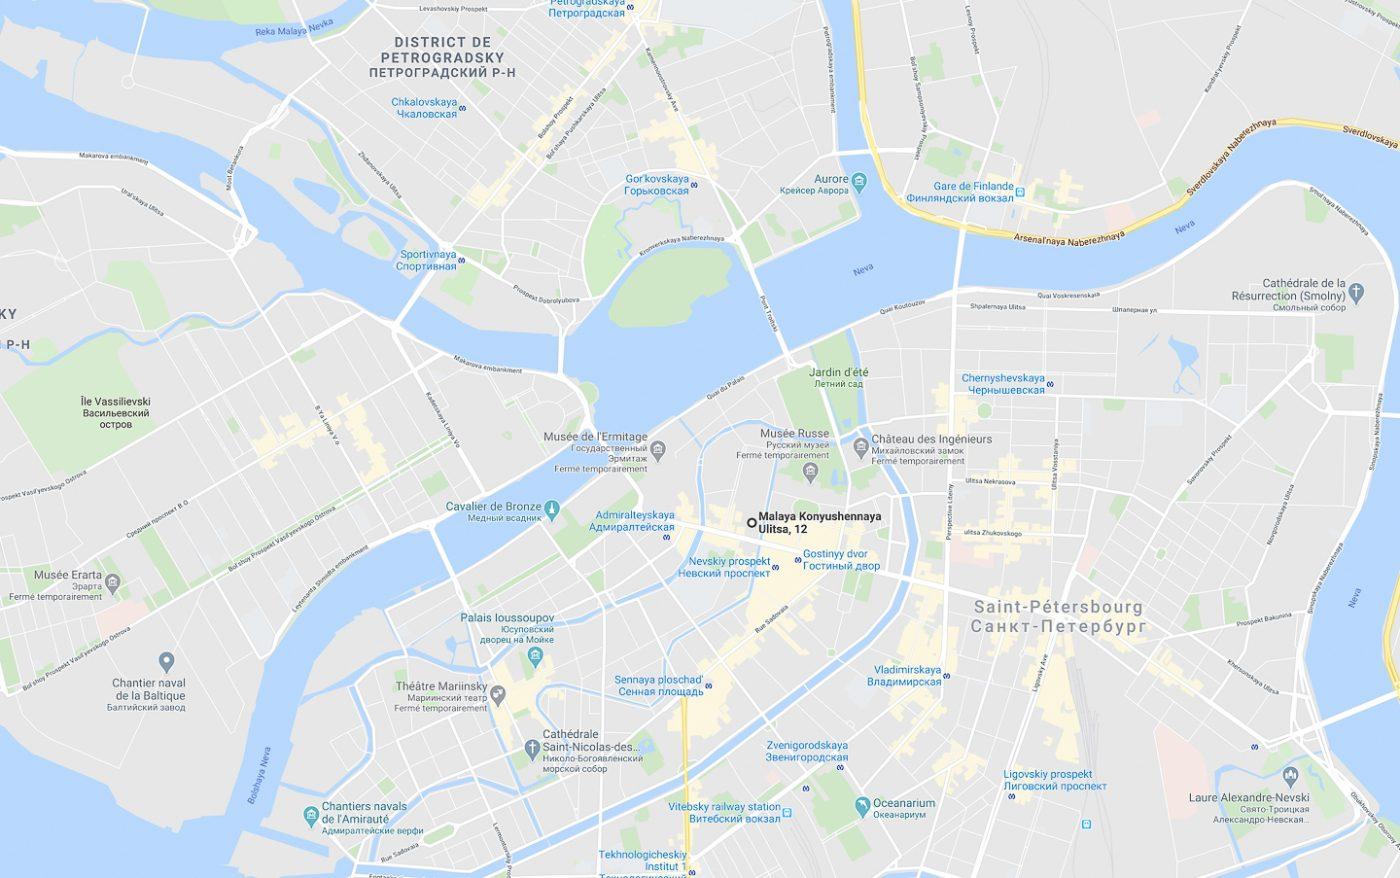 St Pétersbourg - Malaya Konyushennaya